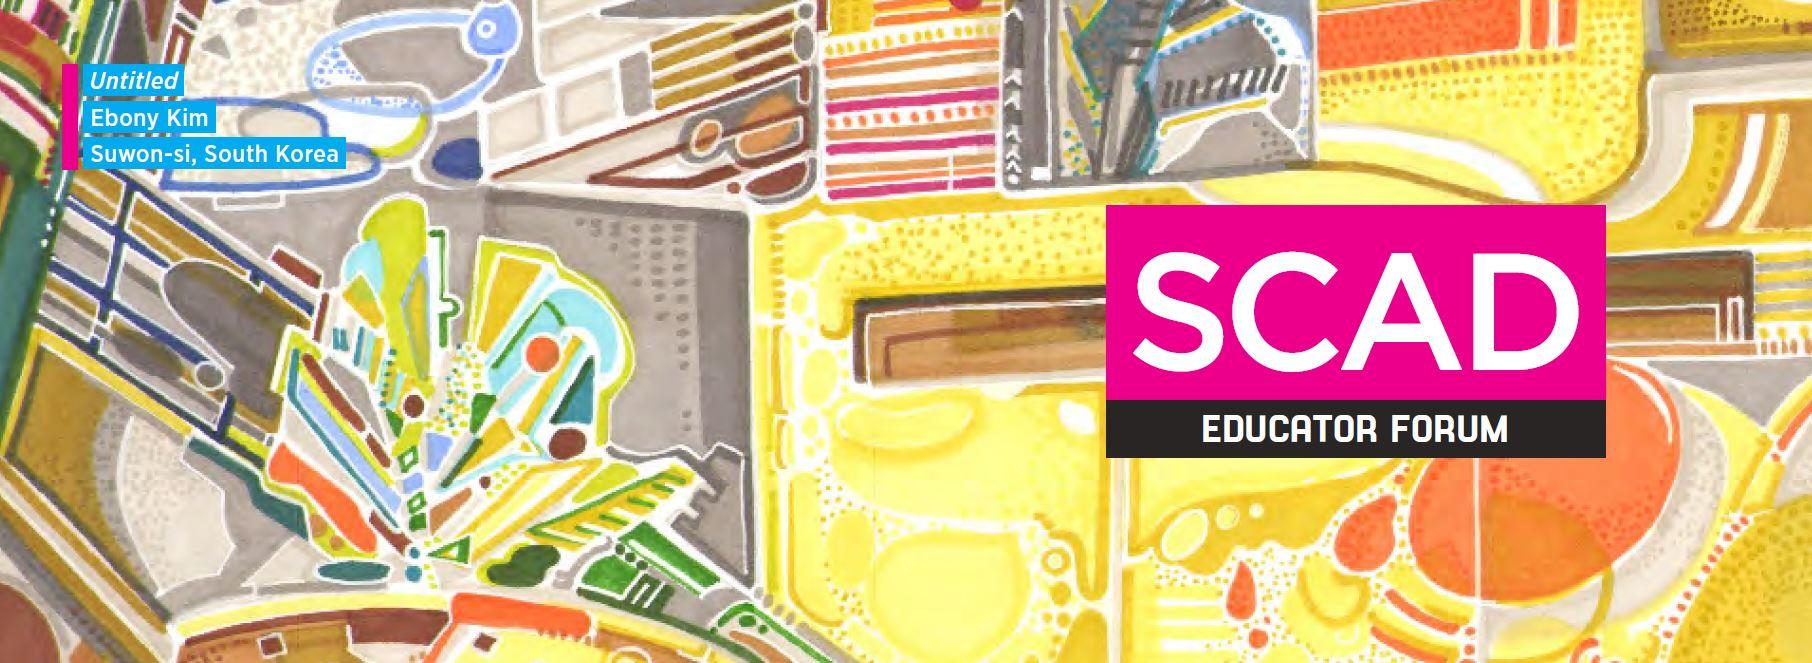 SCAD Educator Forum: Savannah 2020